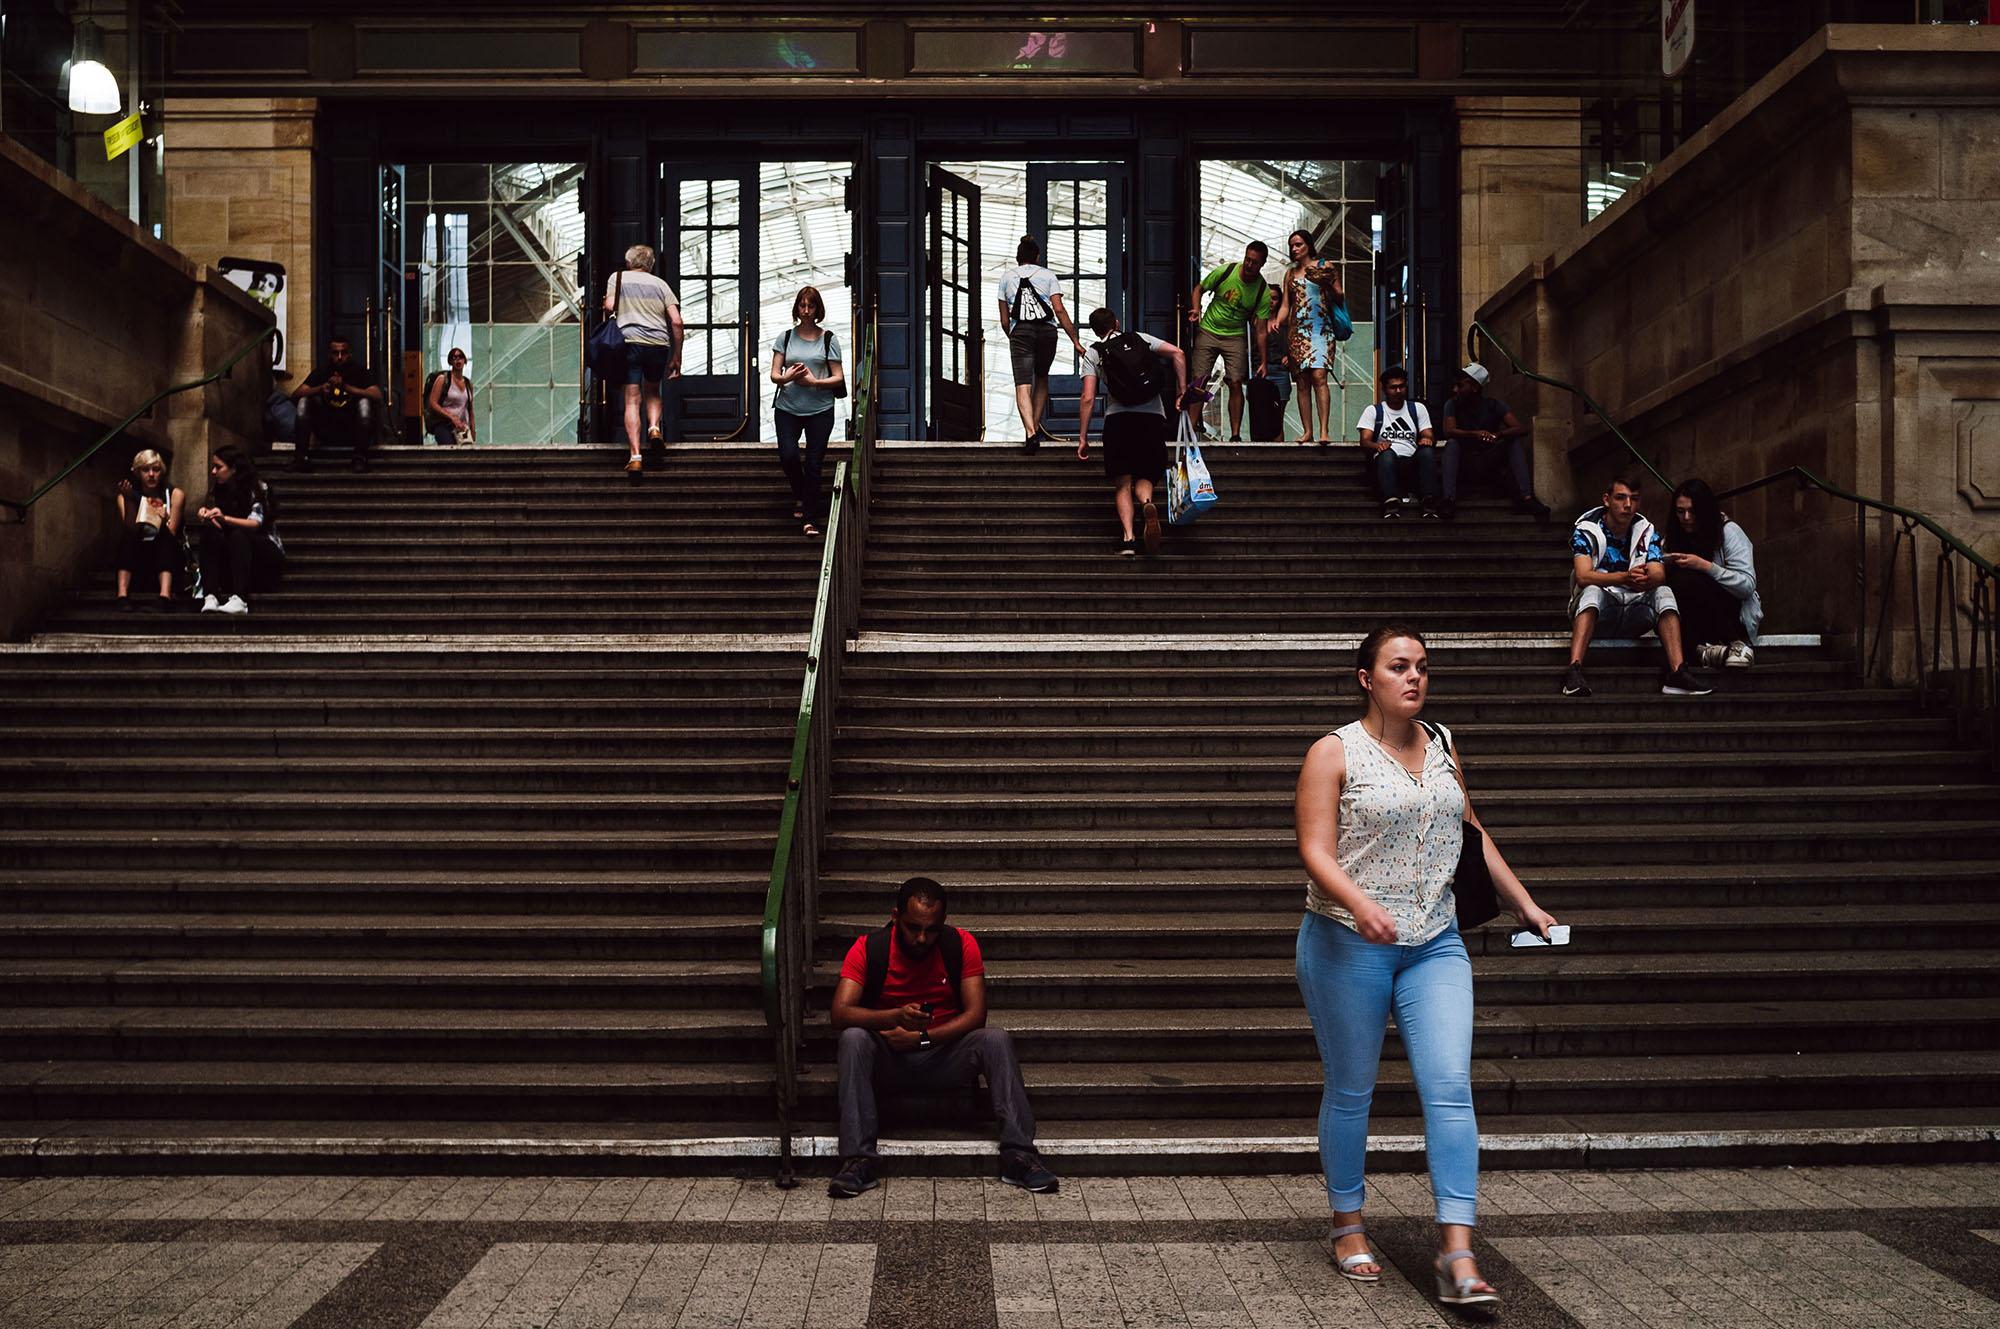 leipzihg main train station street photo